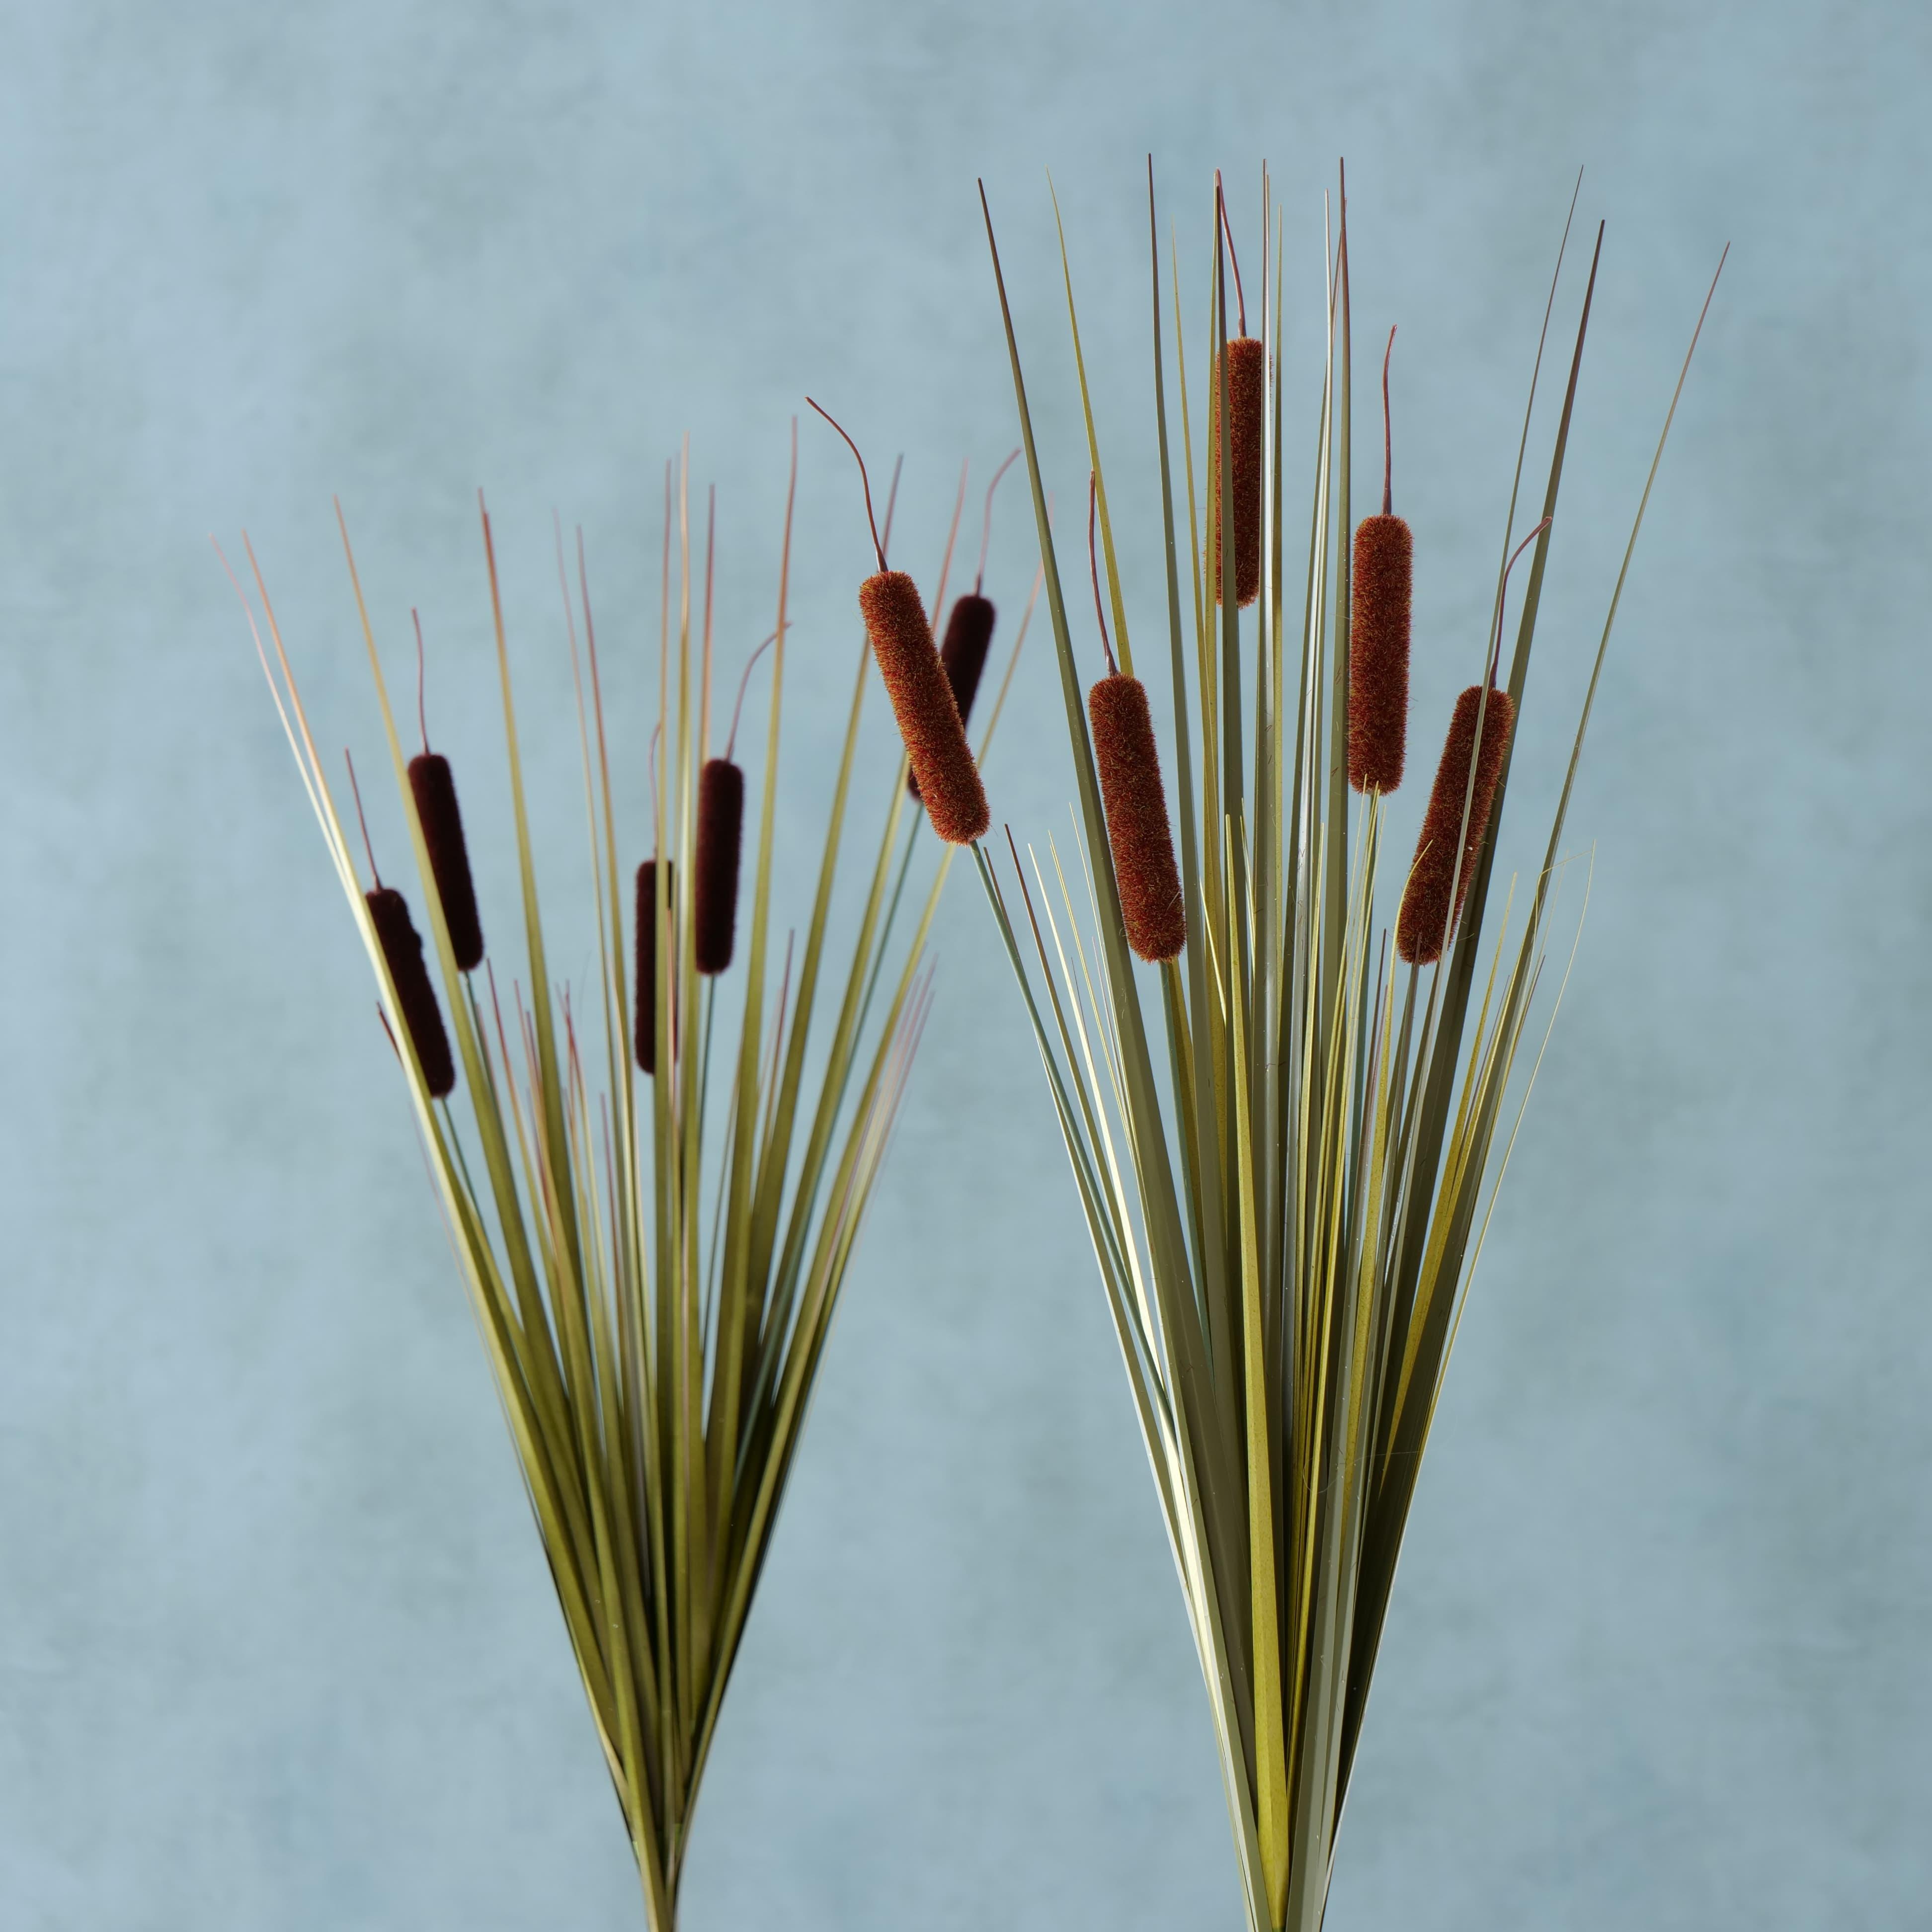 Ramura decorativa artificiala Reeds Maro / Verde, Modele Asortate, H63 cm